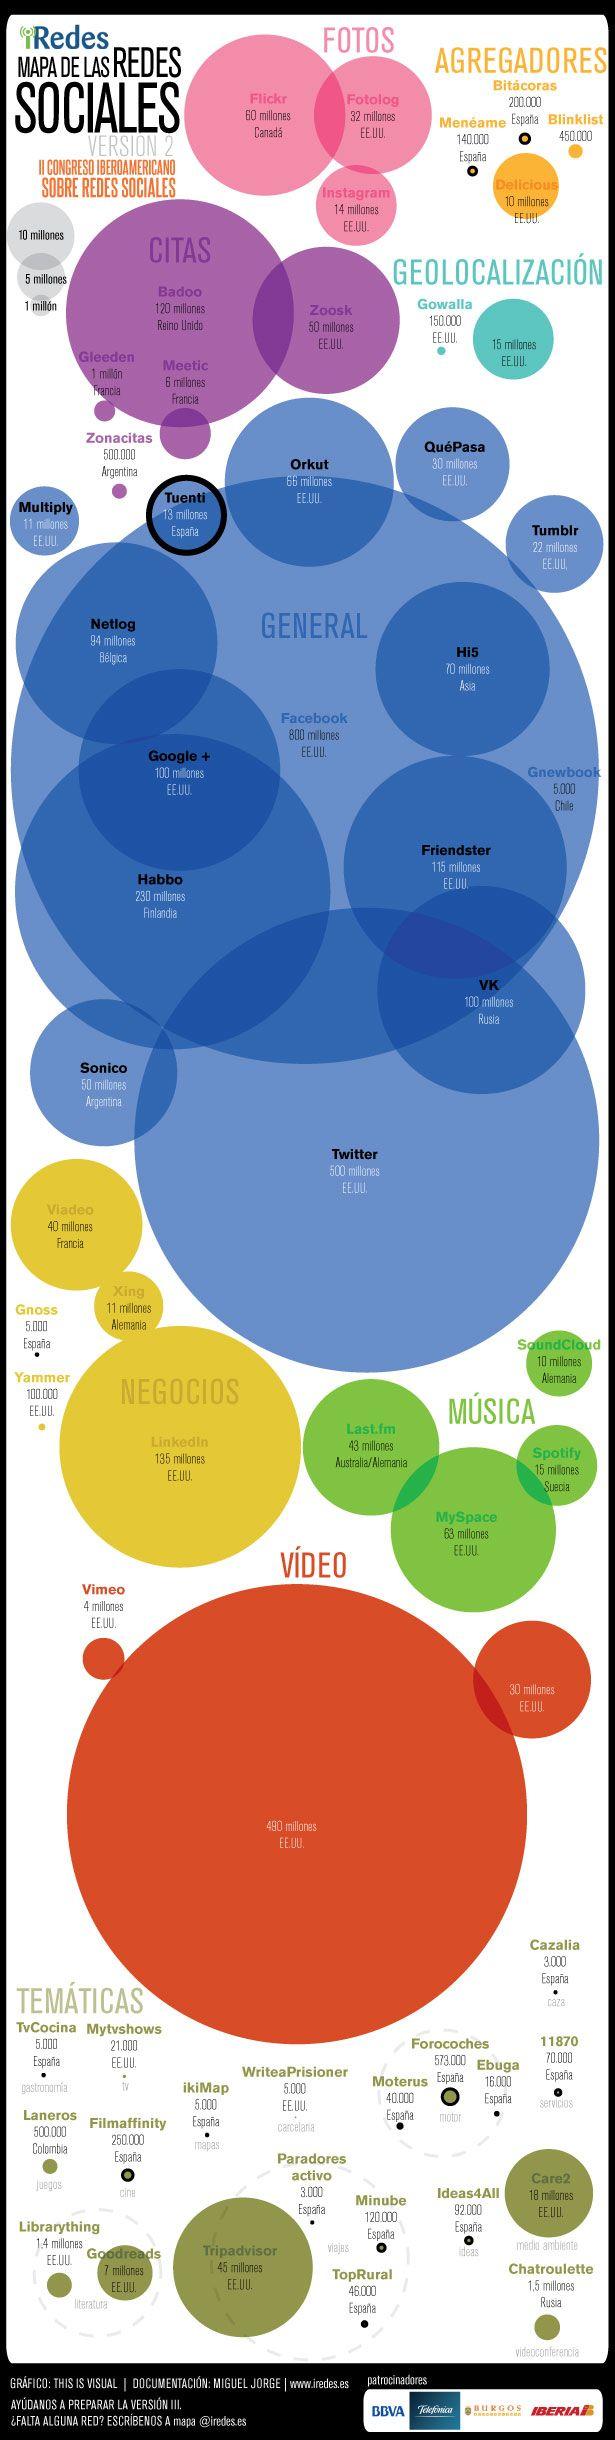 Mapa de las redes sociales versión 2 #infografia #infographic #socialmedia